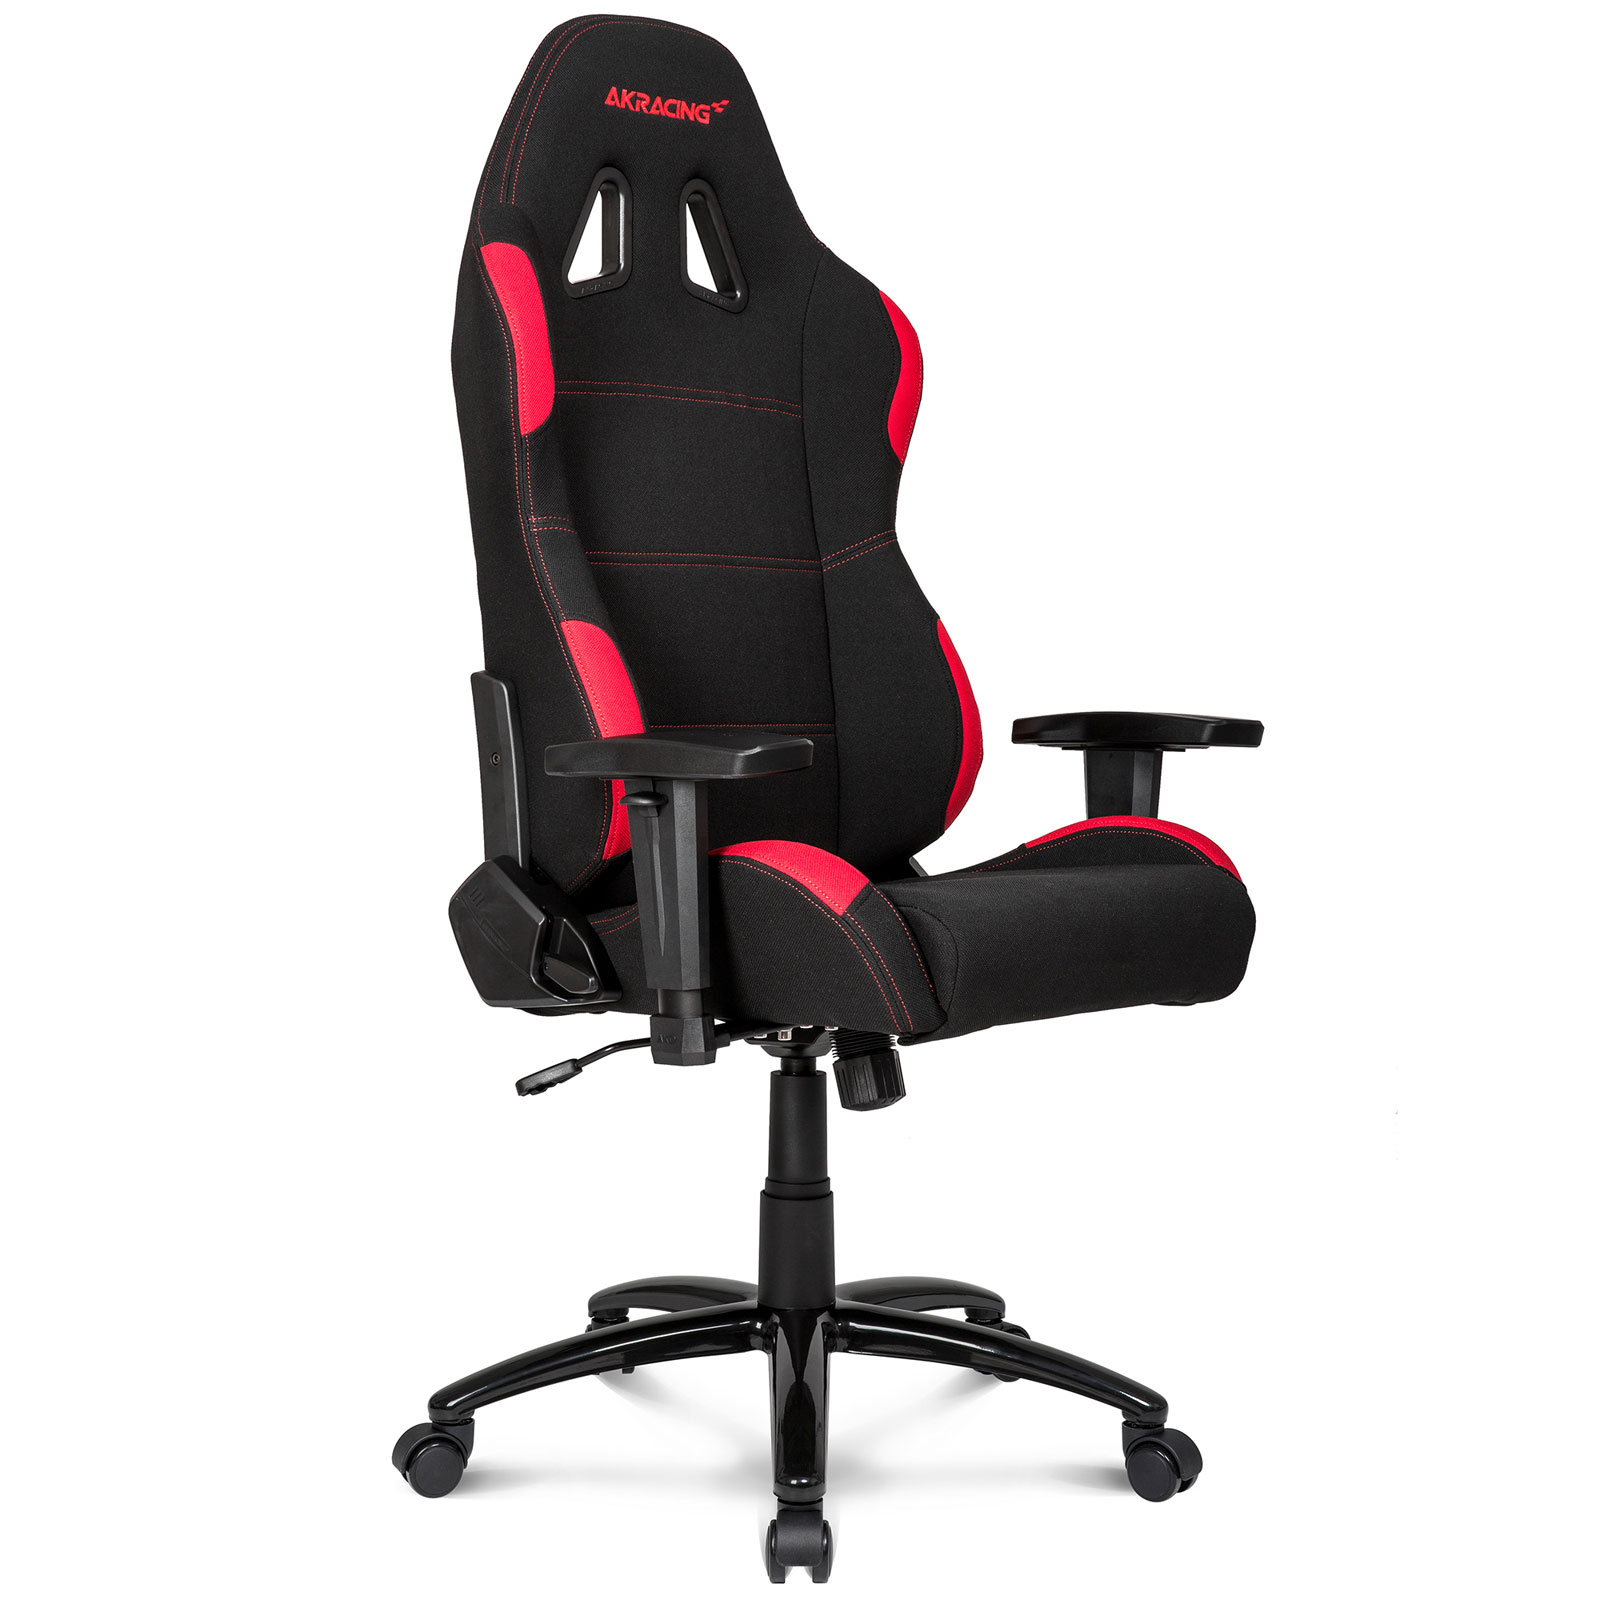 Siège Gamer Akaracing K7012, fauteuil, siège, siège gamer, informatique 974, informatique ile de la réunion